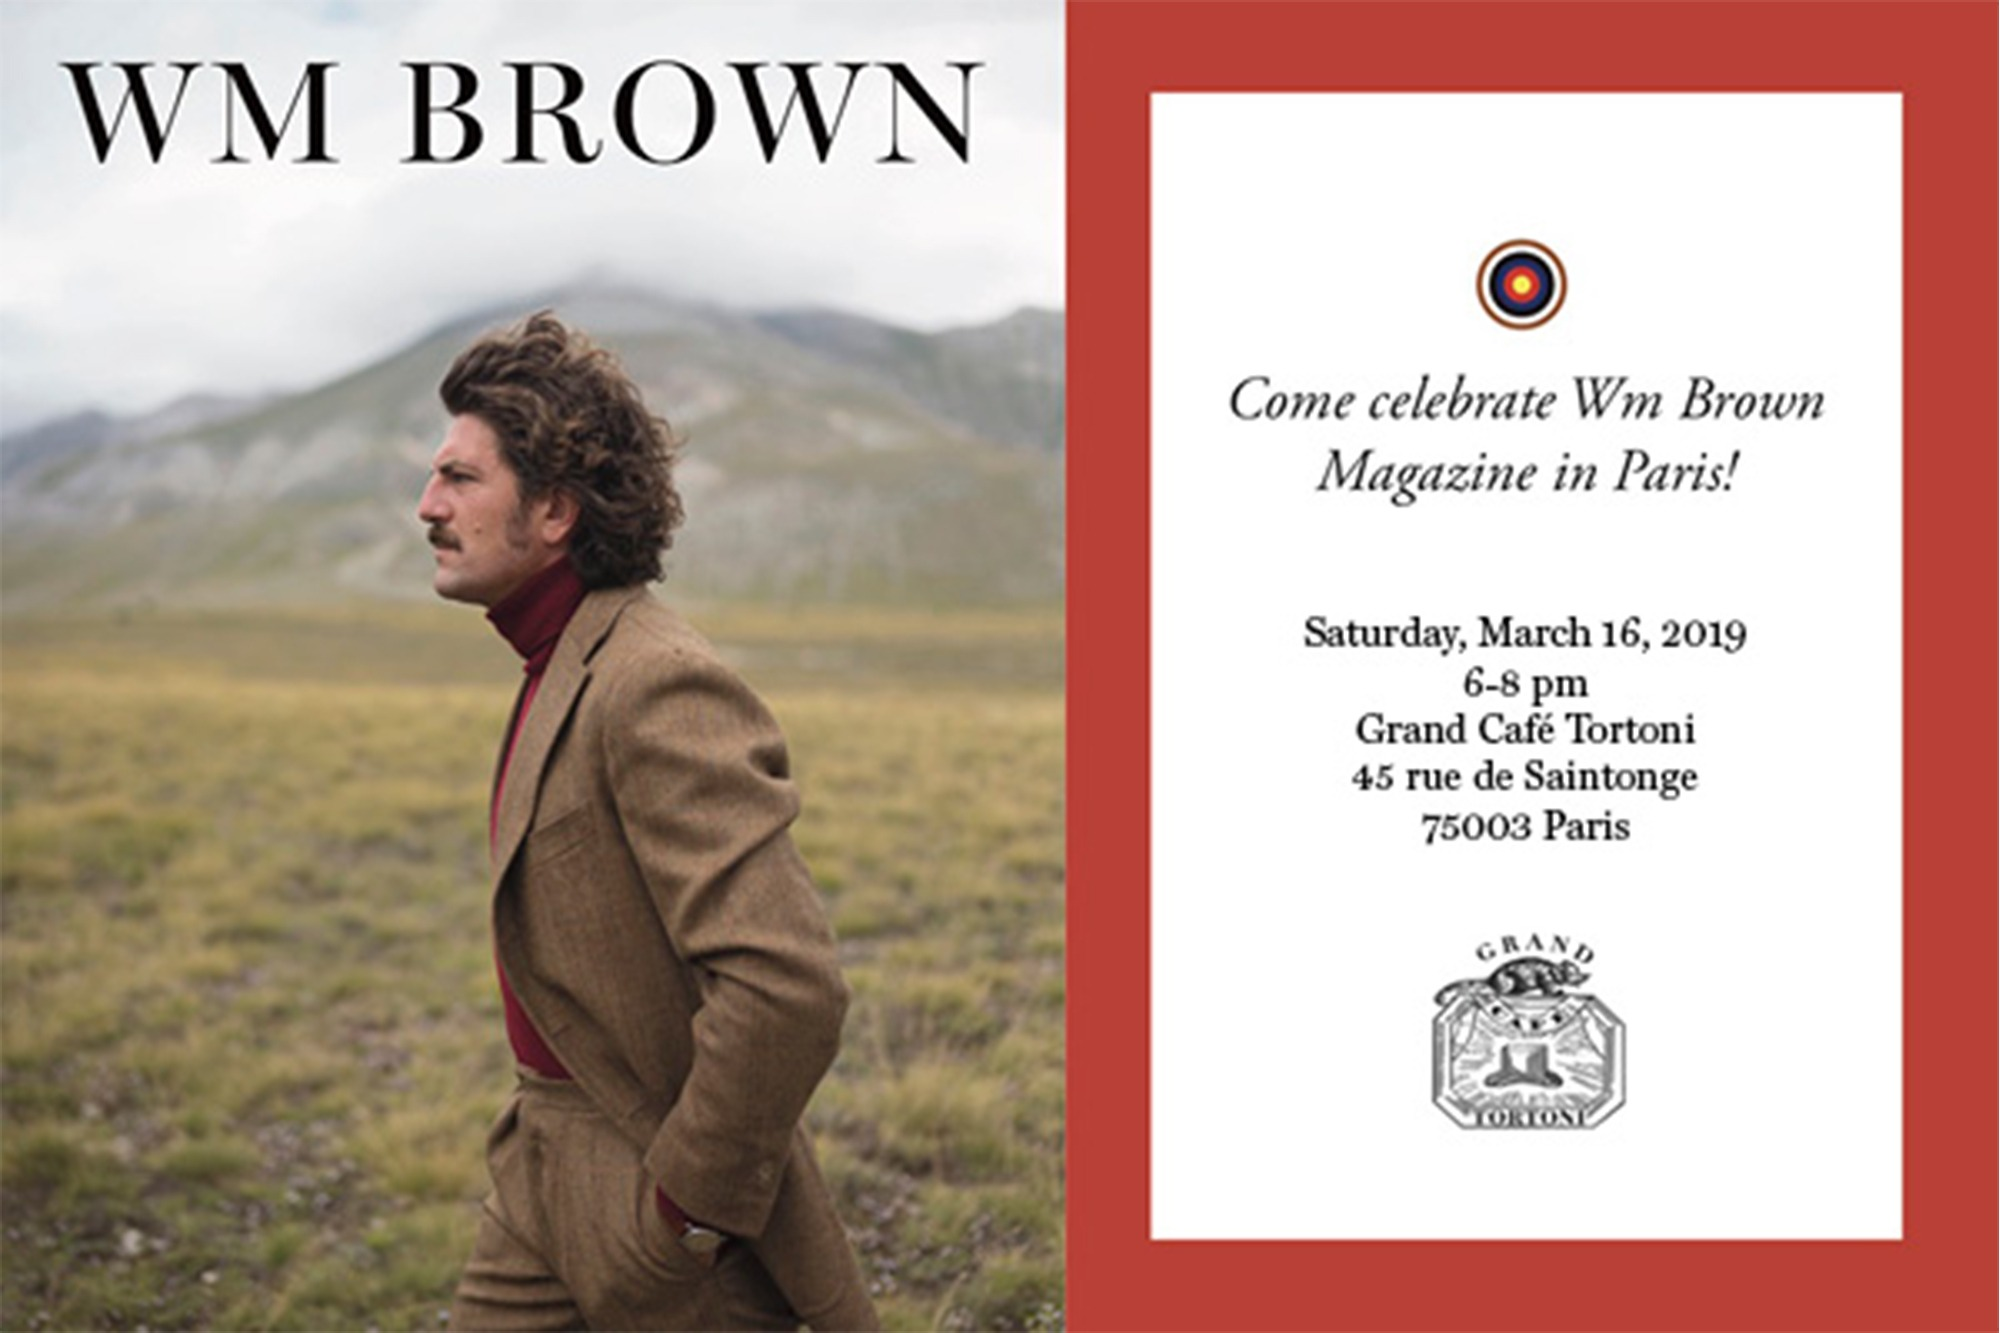 WM BROWN - Soirée du 16 mars